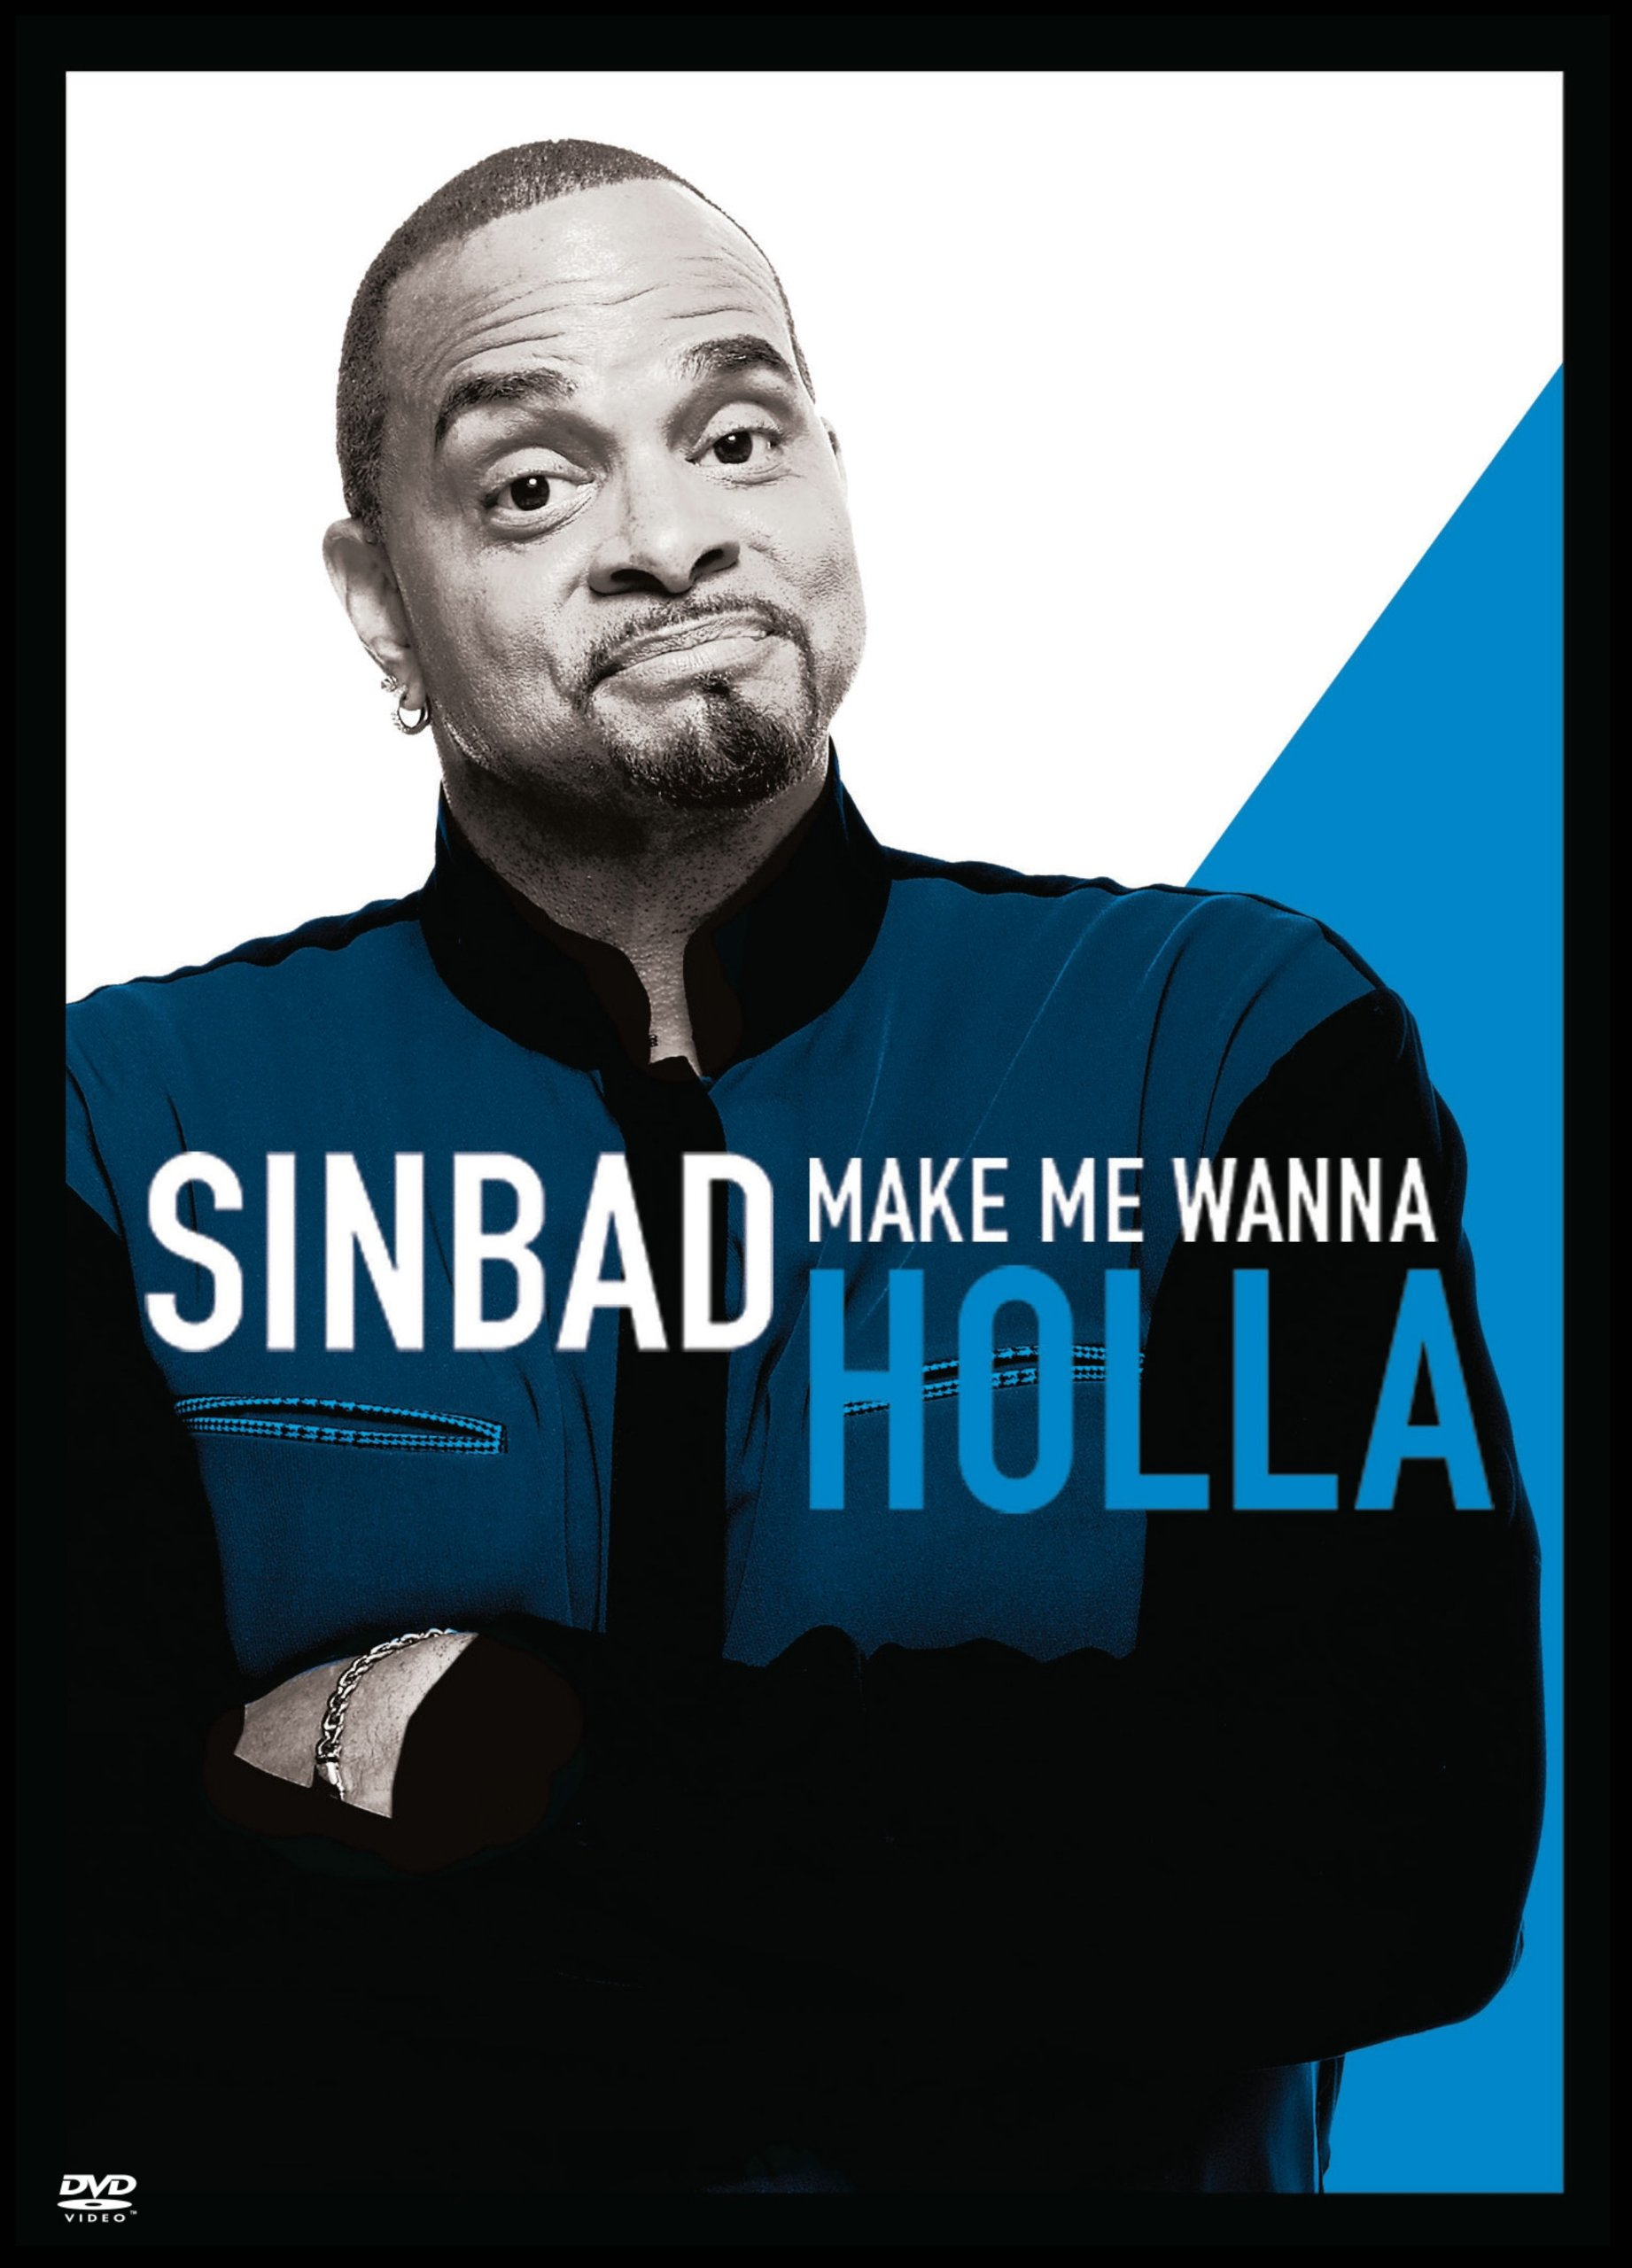 DVD : Aria - Sinbad: Make Me Wanna Holla (Widescreen, Subtitled, Sensormatic)